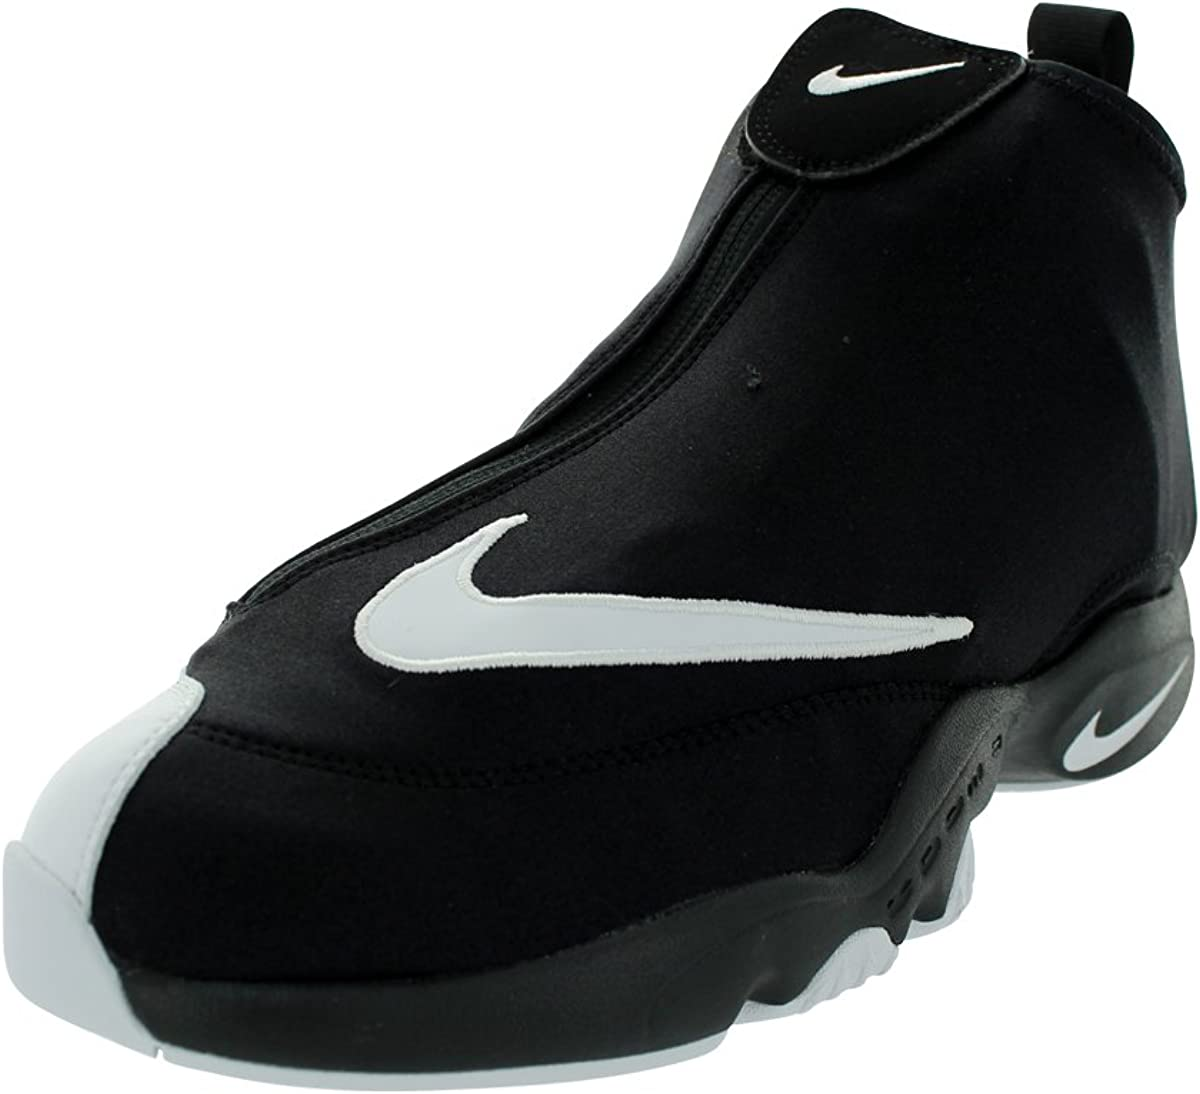 Nike Air Zoom Flight The Glove BlackWhite (Gary Payton